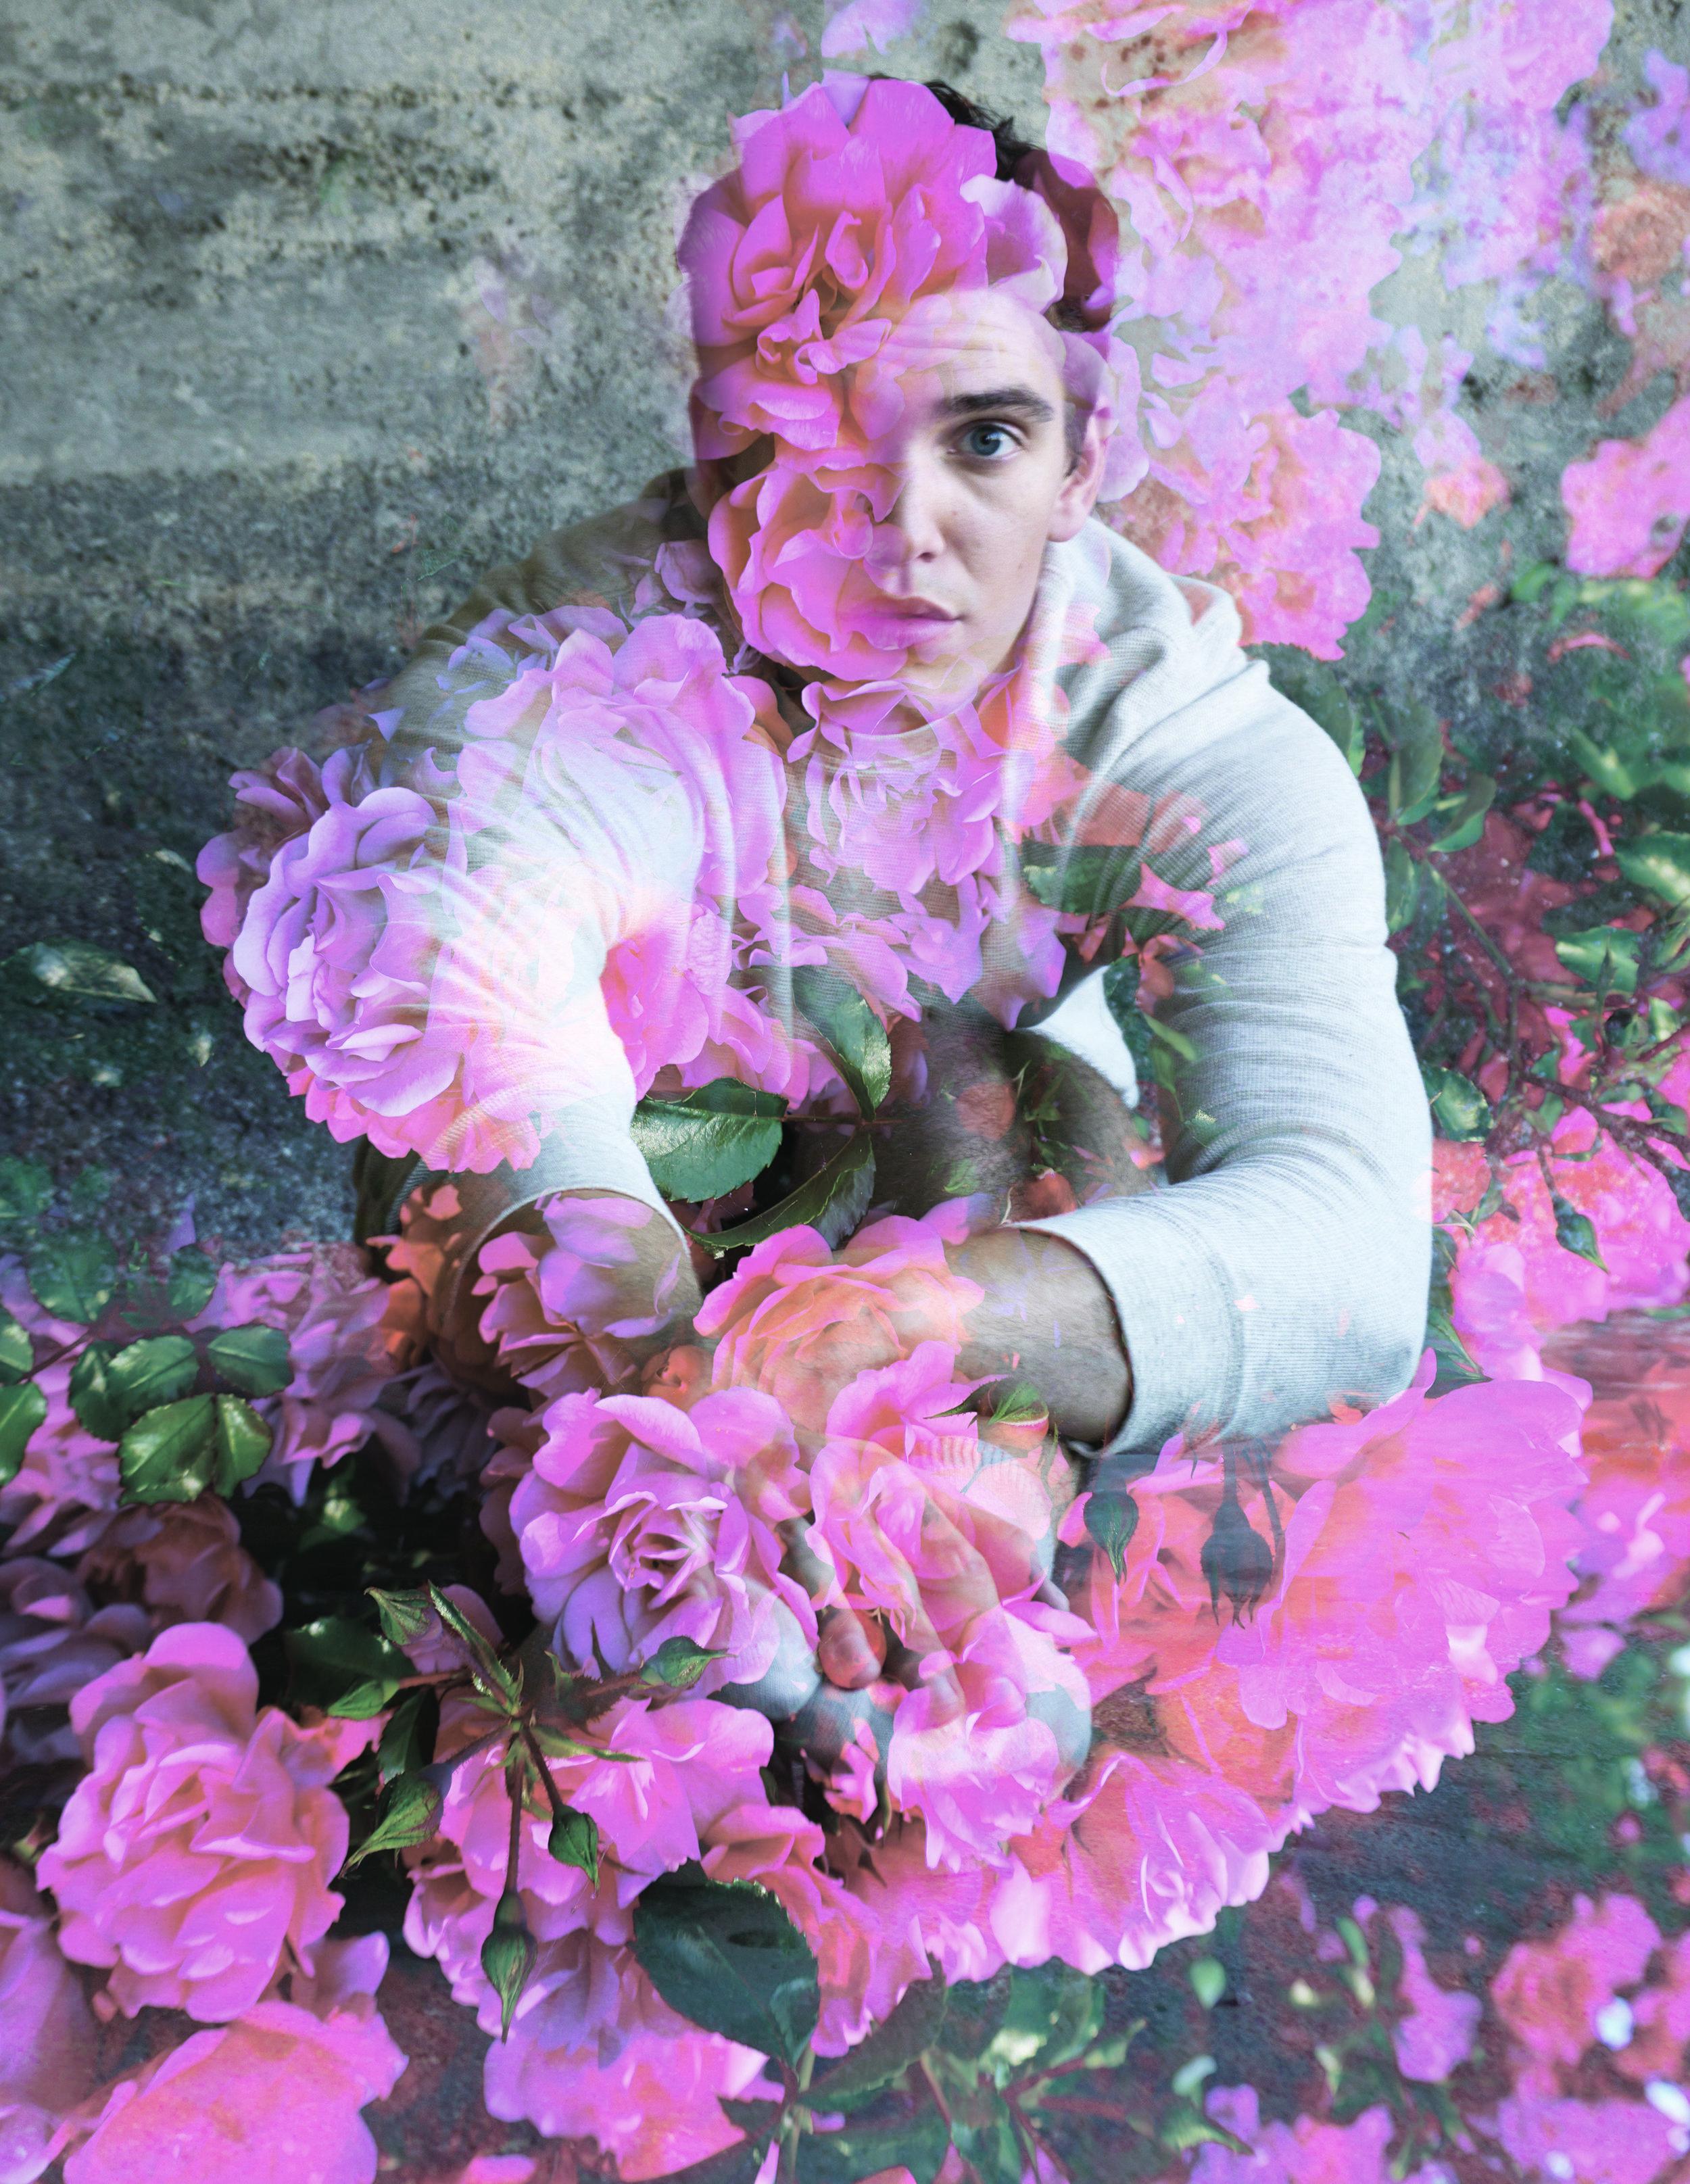 ART140 Digital Photography - Multiple Exposure: Veronica Wynhausen